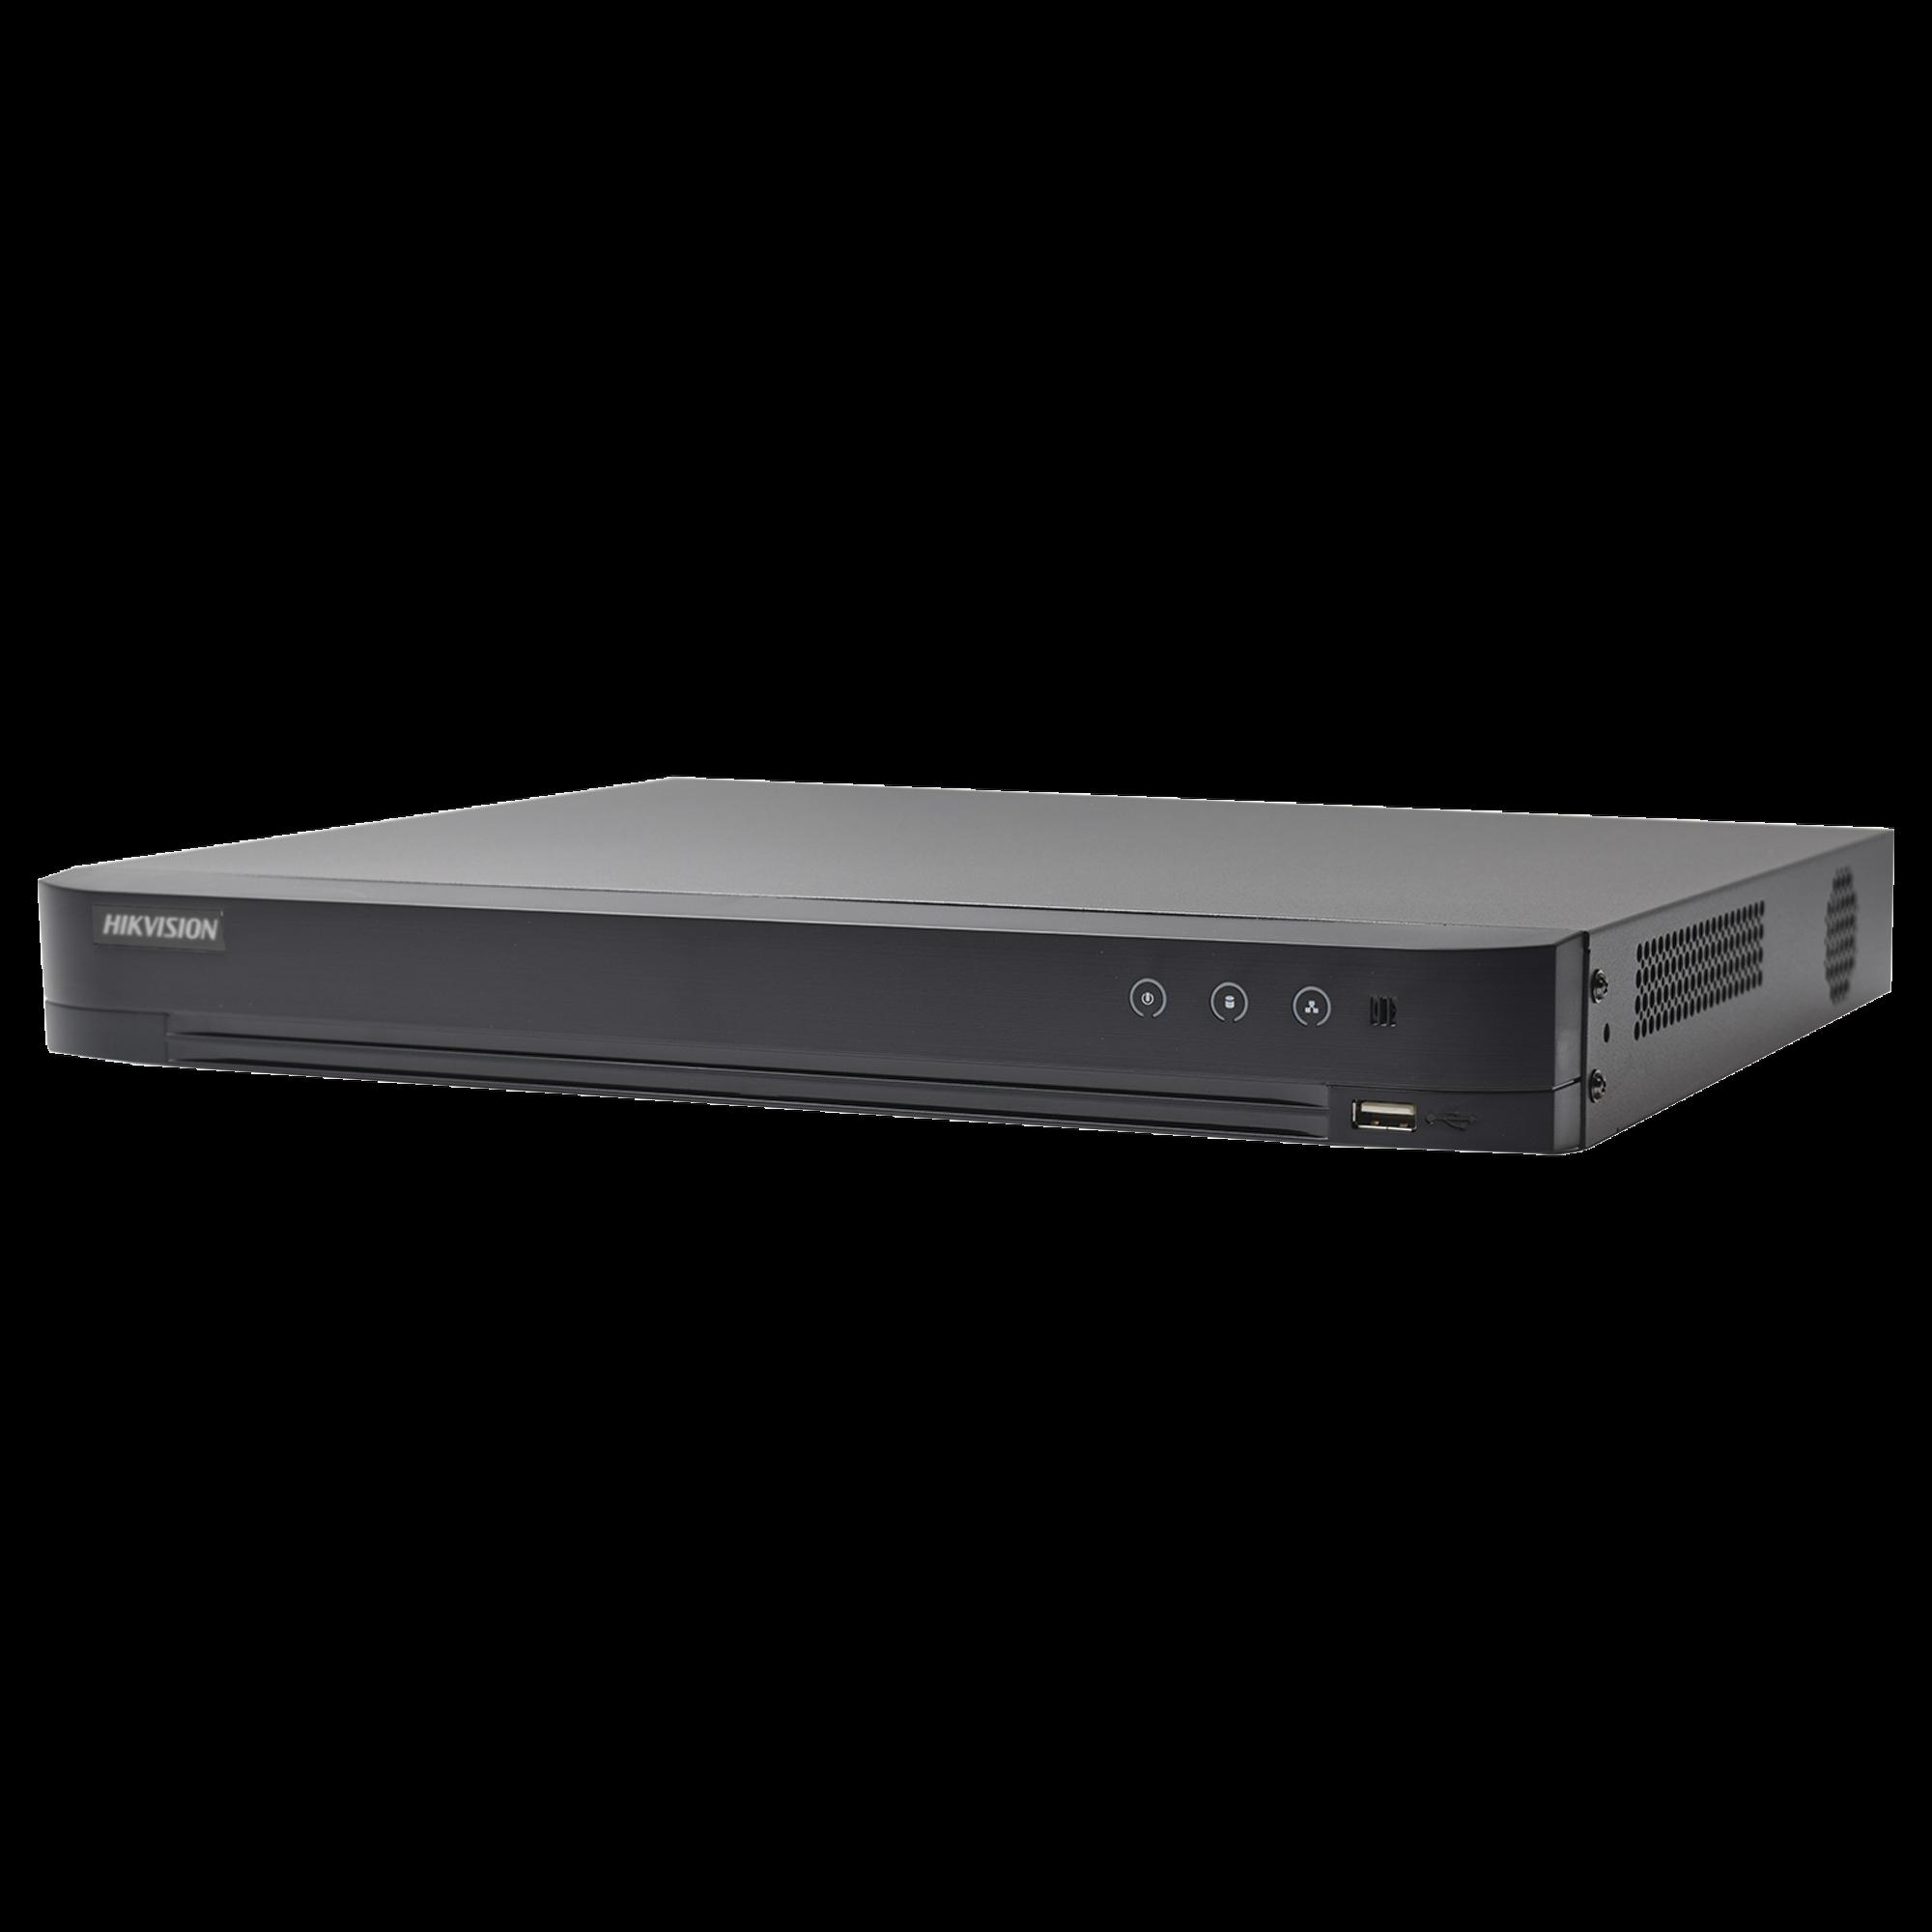 DVR 4 Megapixel / 4 Canales TURBOHD + 2 Canales IP / 1 Bahía de Disco Duro / 1 Canal de Audio / Vídeoanálisis